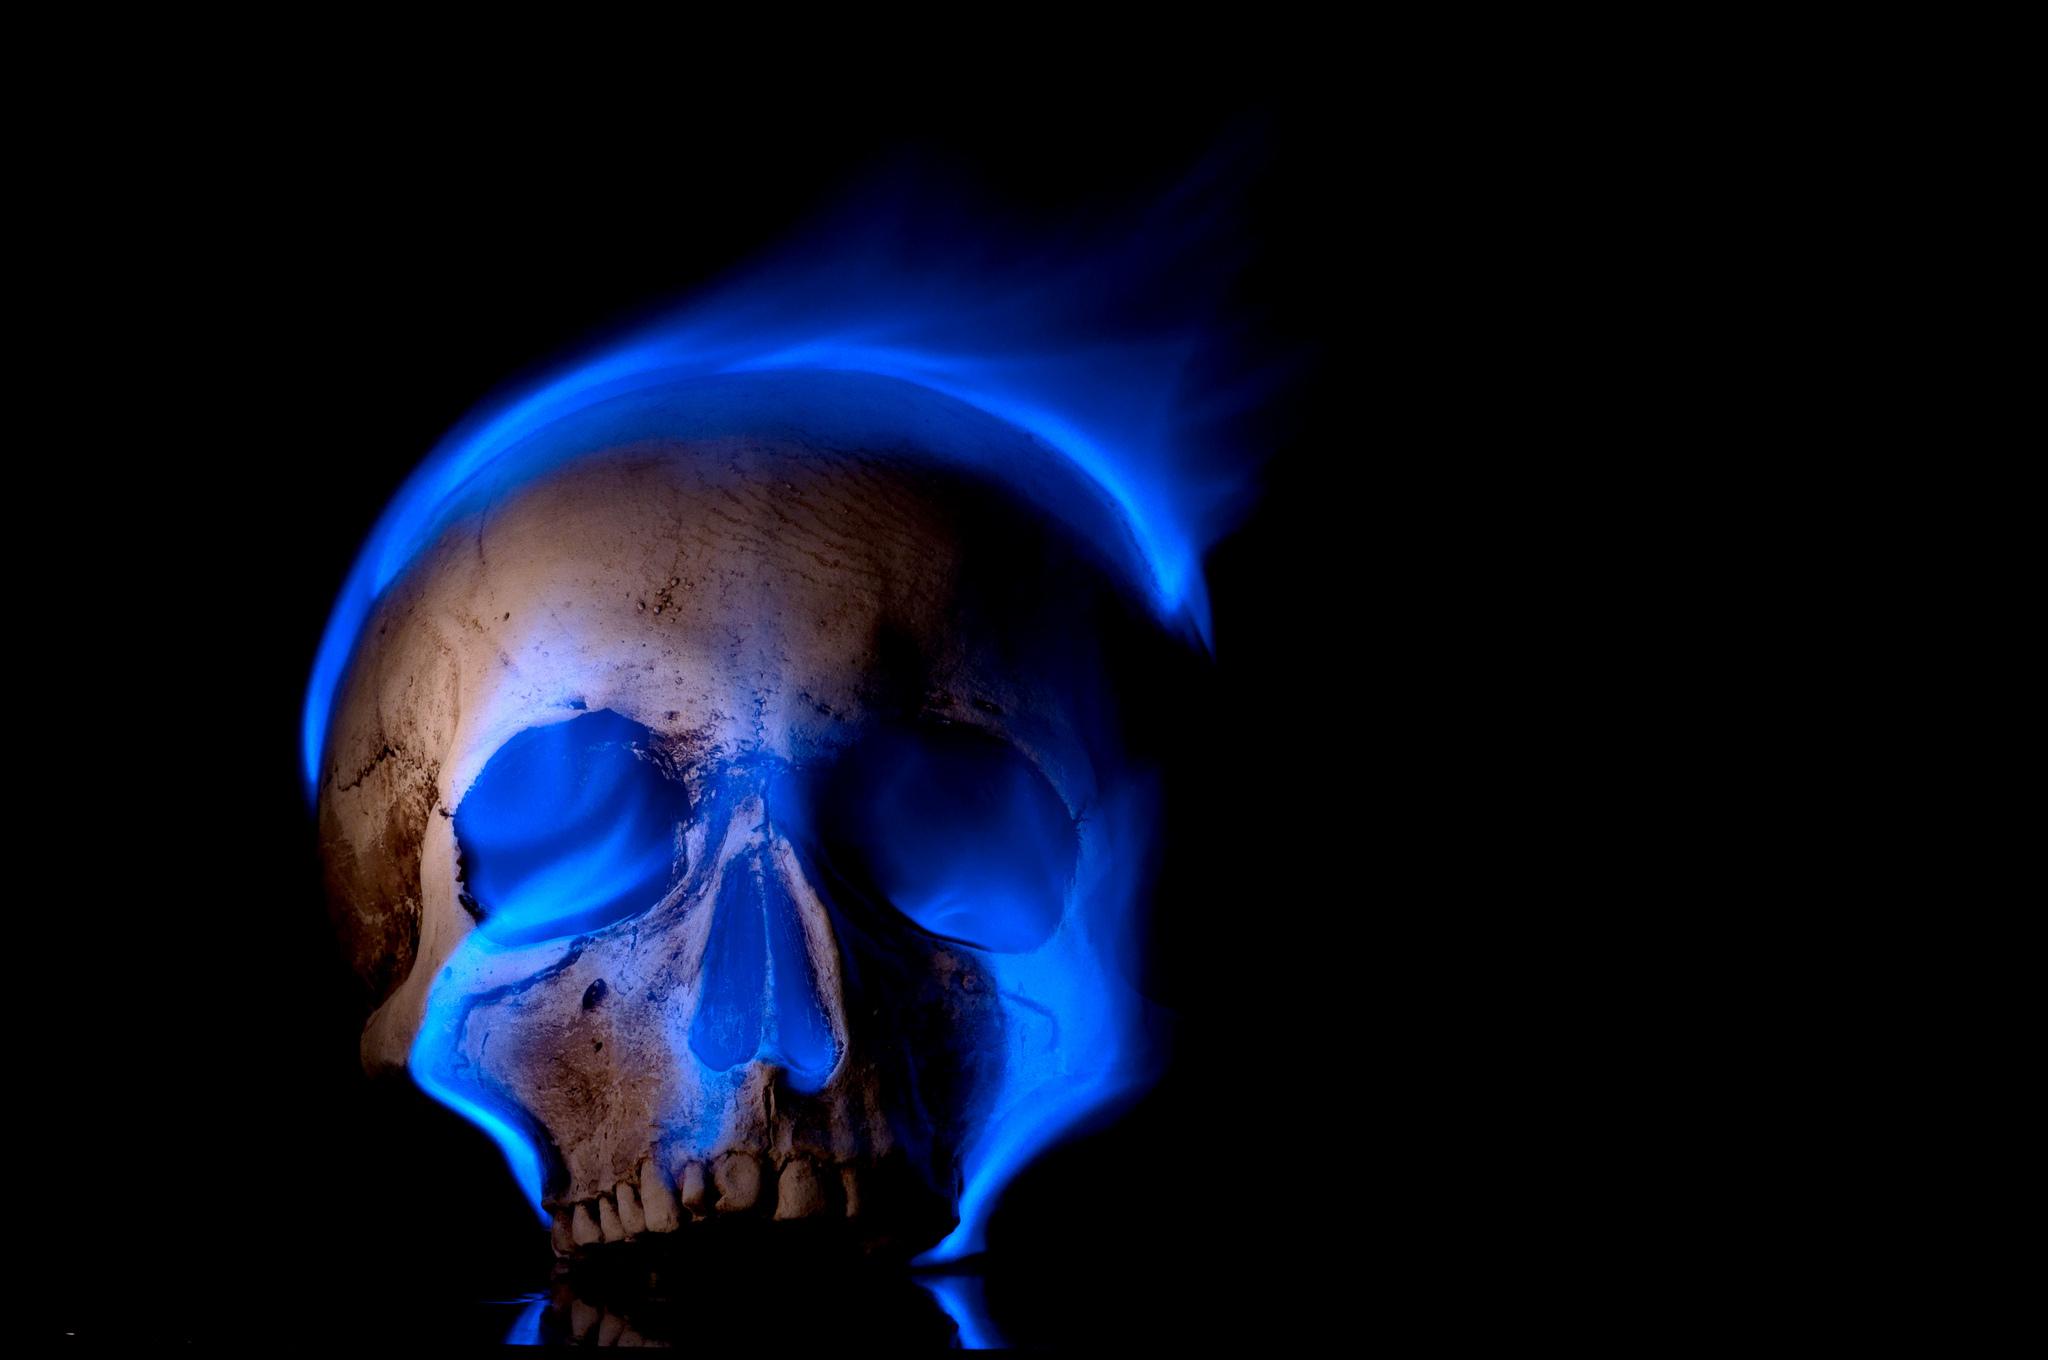 Wallpaper skull skull flame background wallpapers miscellanea 2048x1360